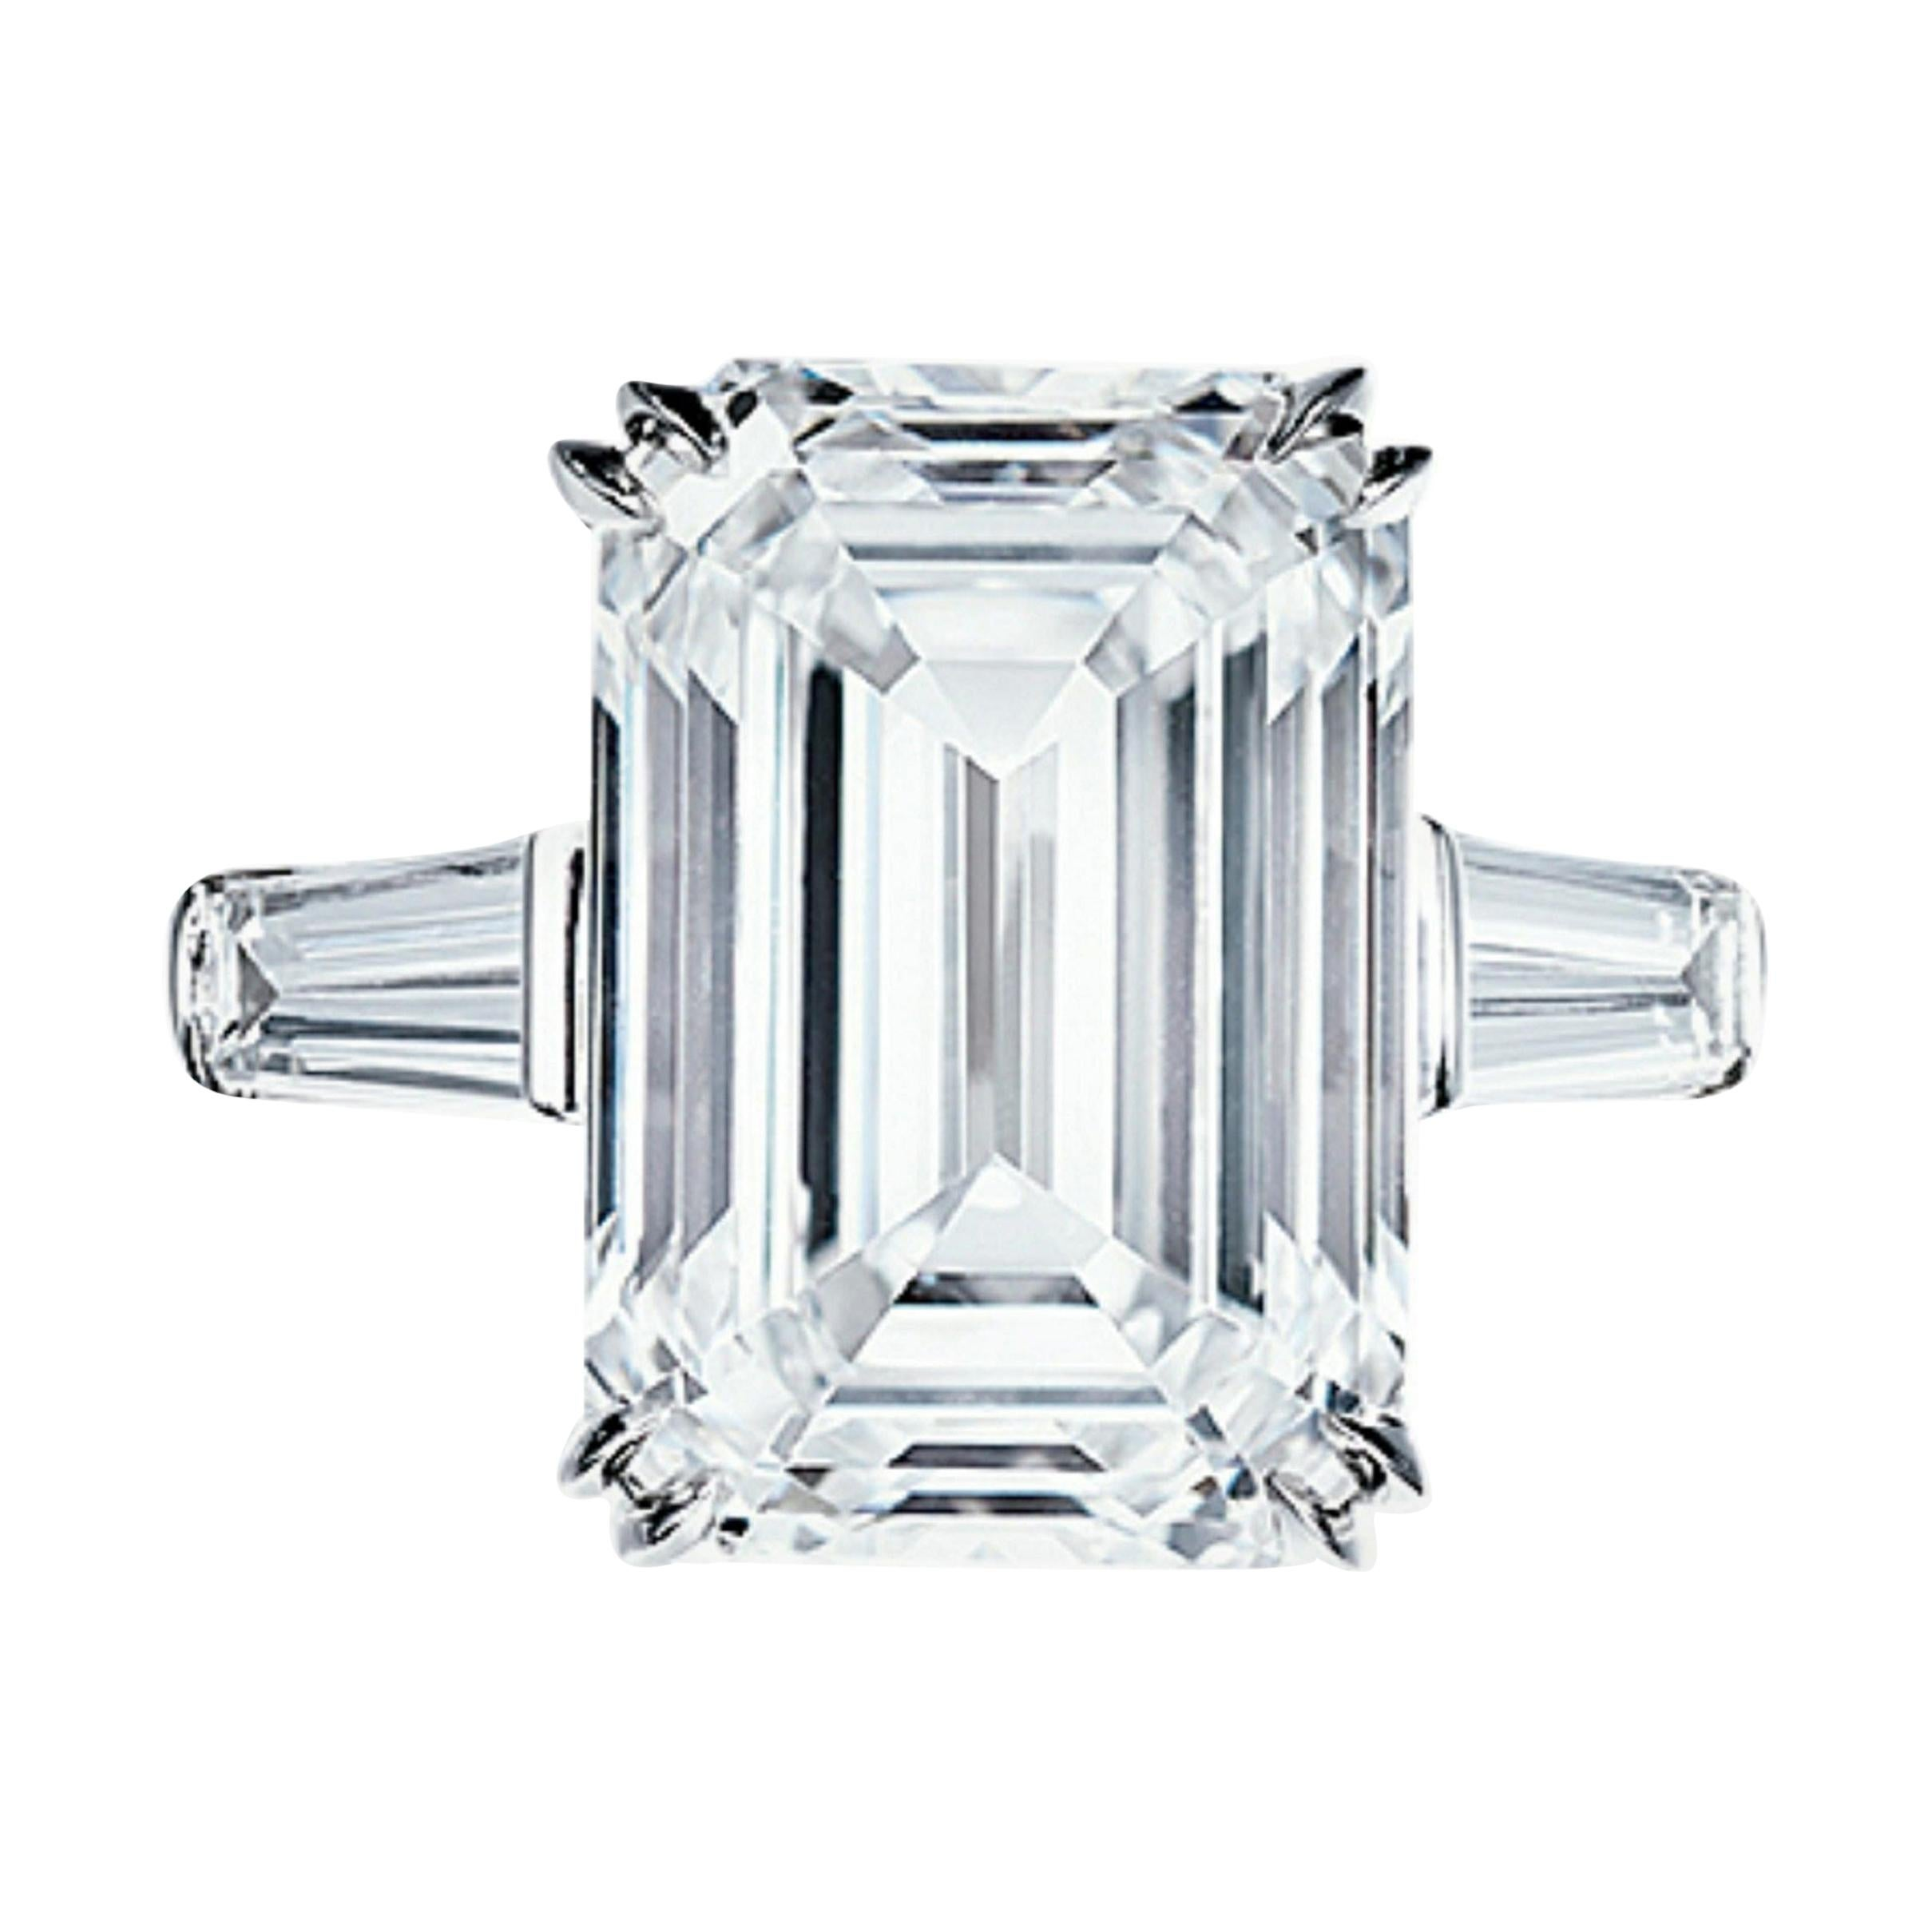 Flawless Clarity GIA Certified 5.65 Carat Emerald Cut Diamond Platinum Ring